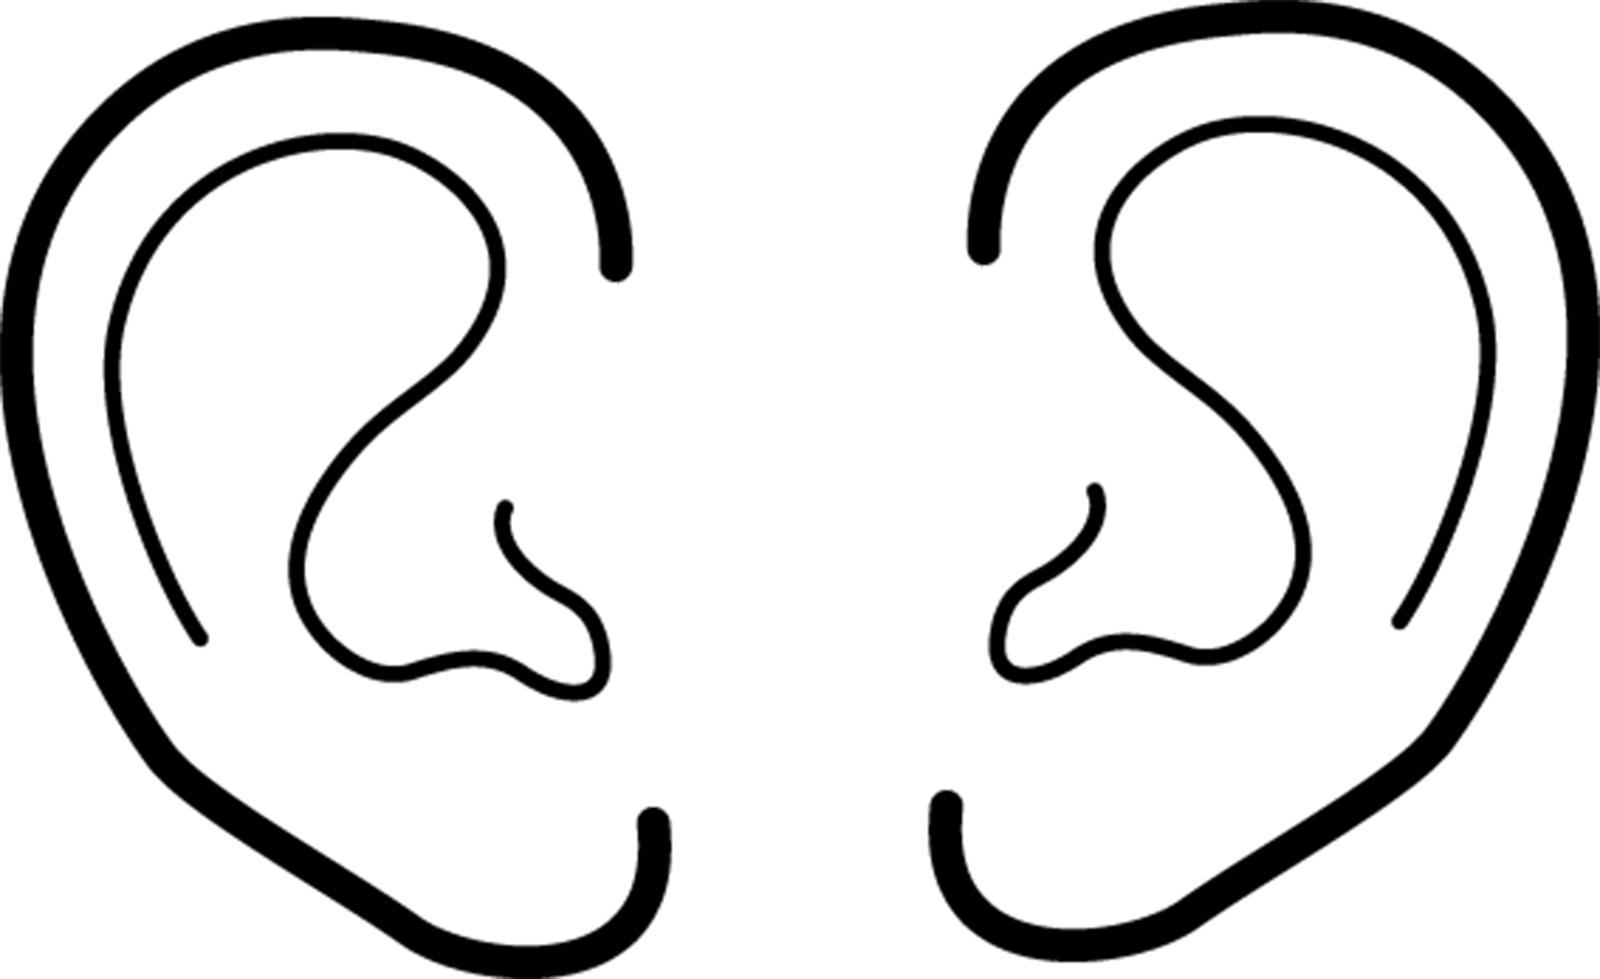 Viewing Gallery For Ears-Viewing Gallery For Ears-17